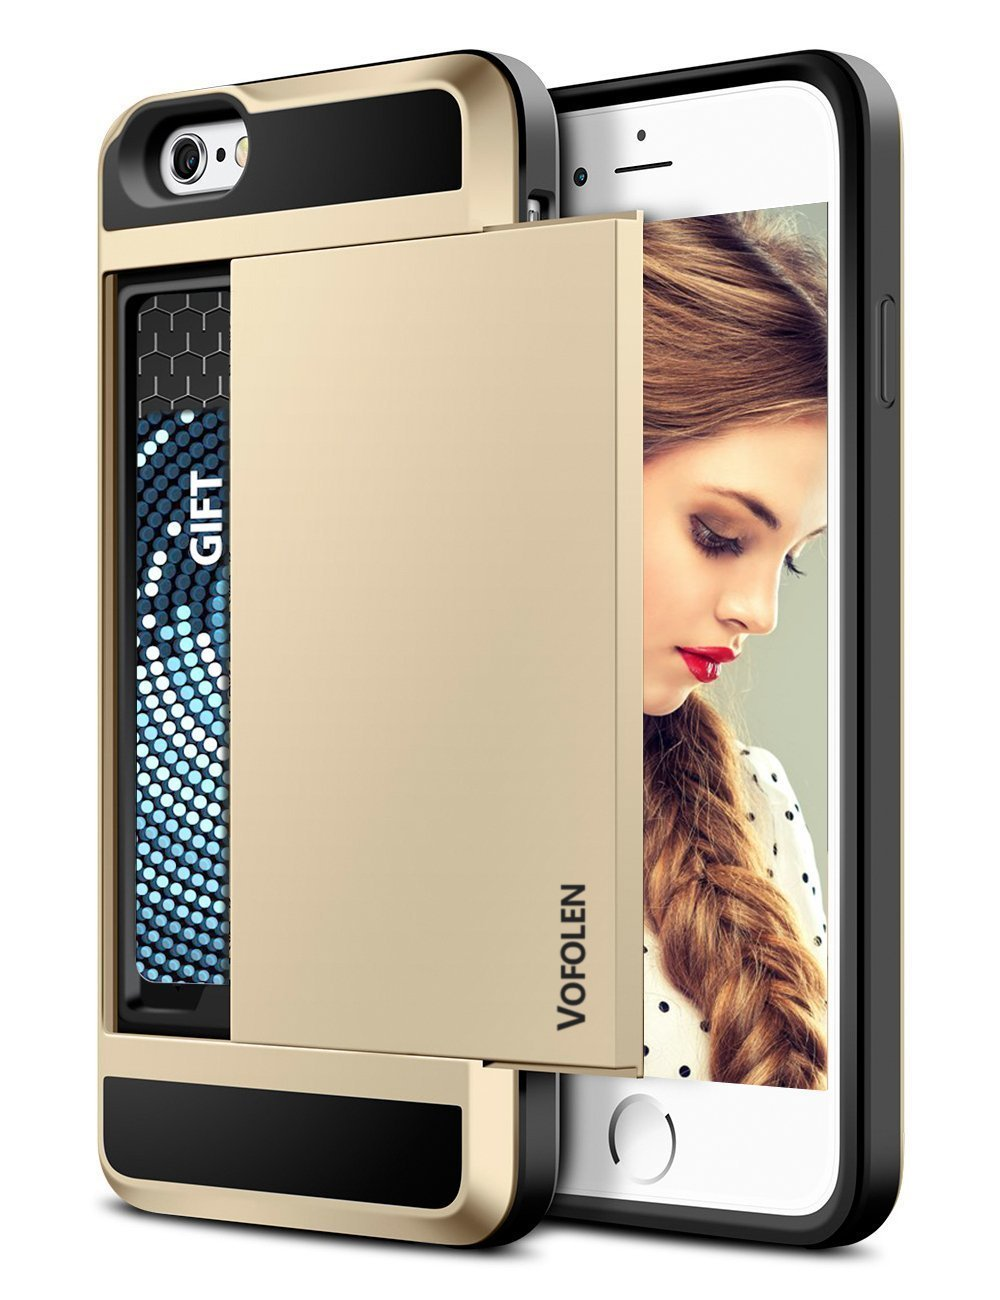 Vofolen Card Holder iPhone 6 Plus Wallet Case Dual Layer - GOLD/BLACK